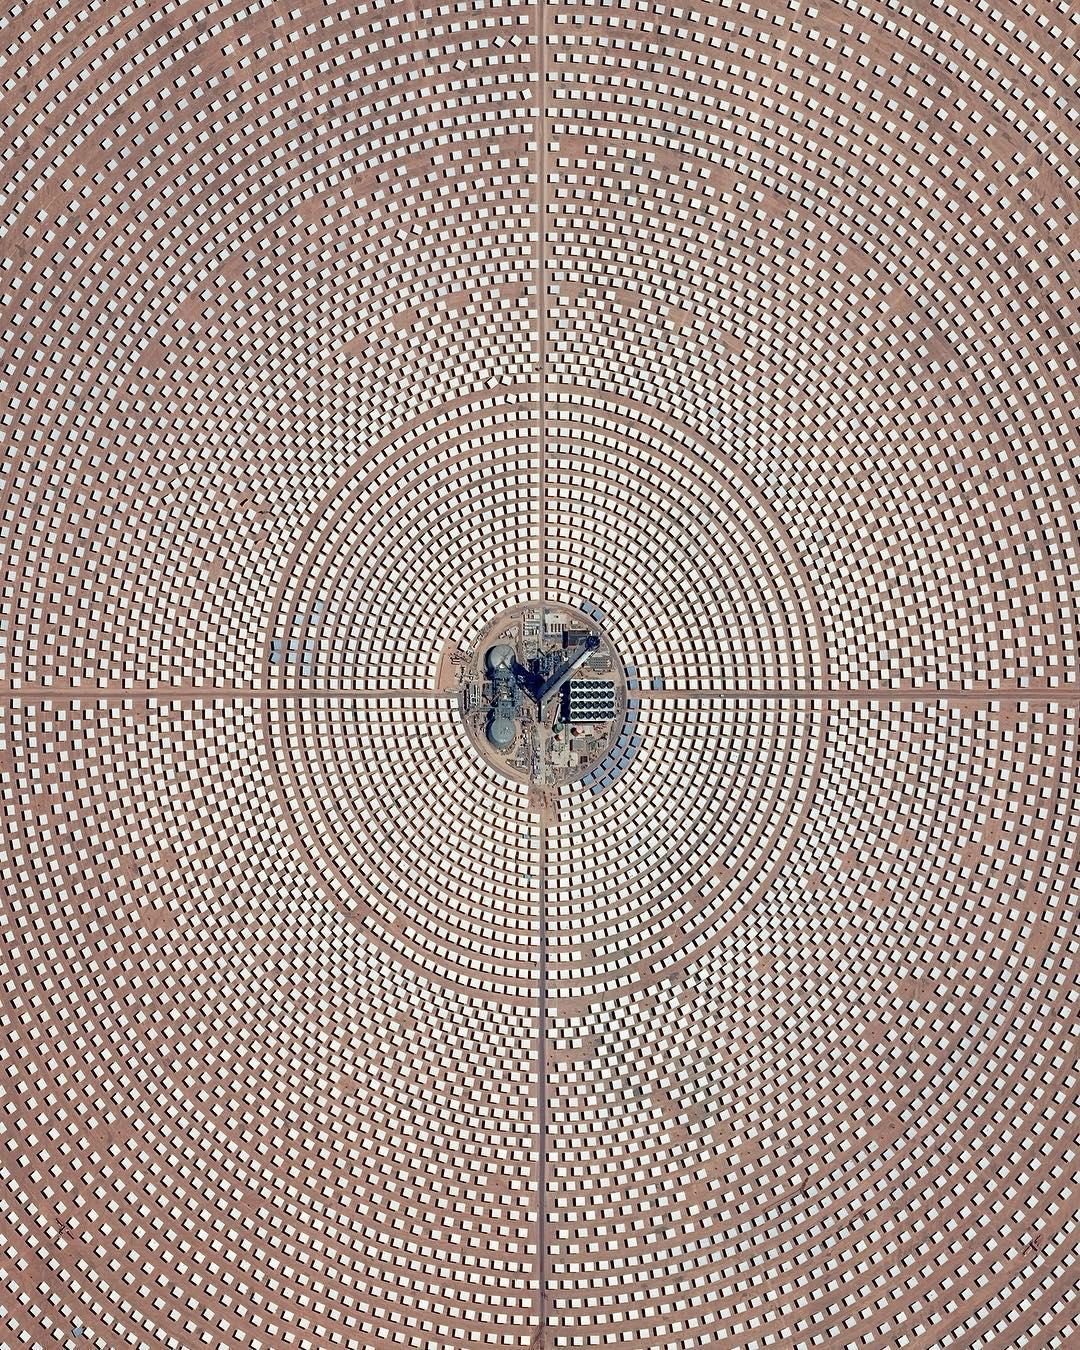 Варзазатская солнечная электростанция